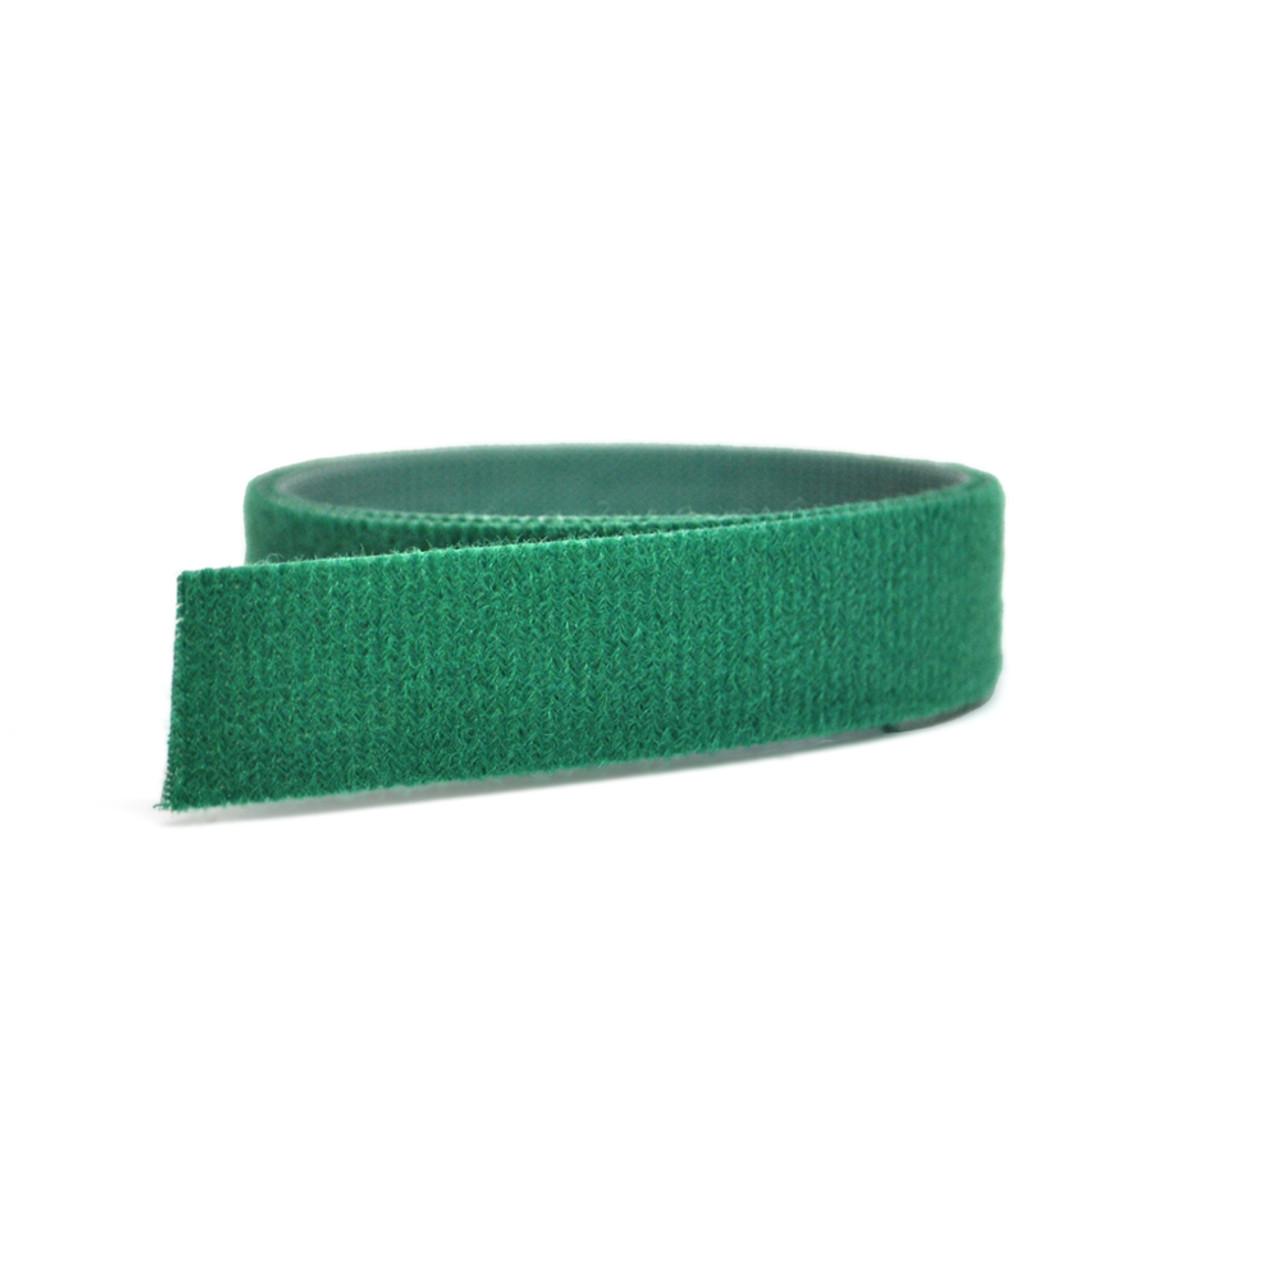 VELCRO® Brand ONE-WRAP® Tape Green Mini Rolls / Velcro Straps - Bundling Straps - Velcro Tie - Velcro Strap